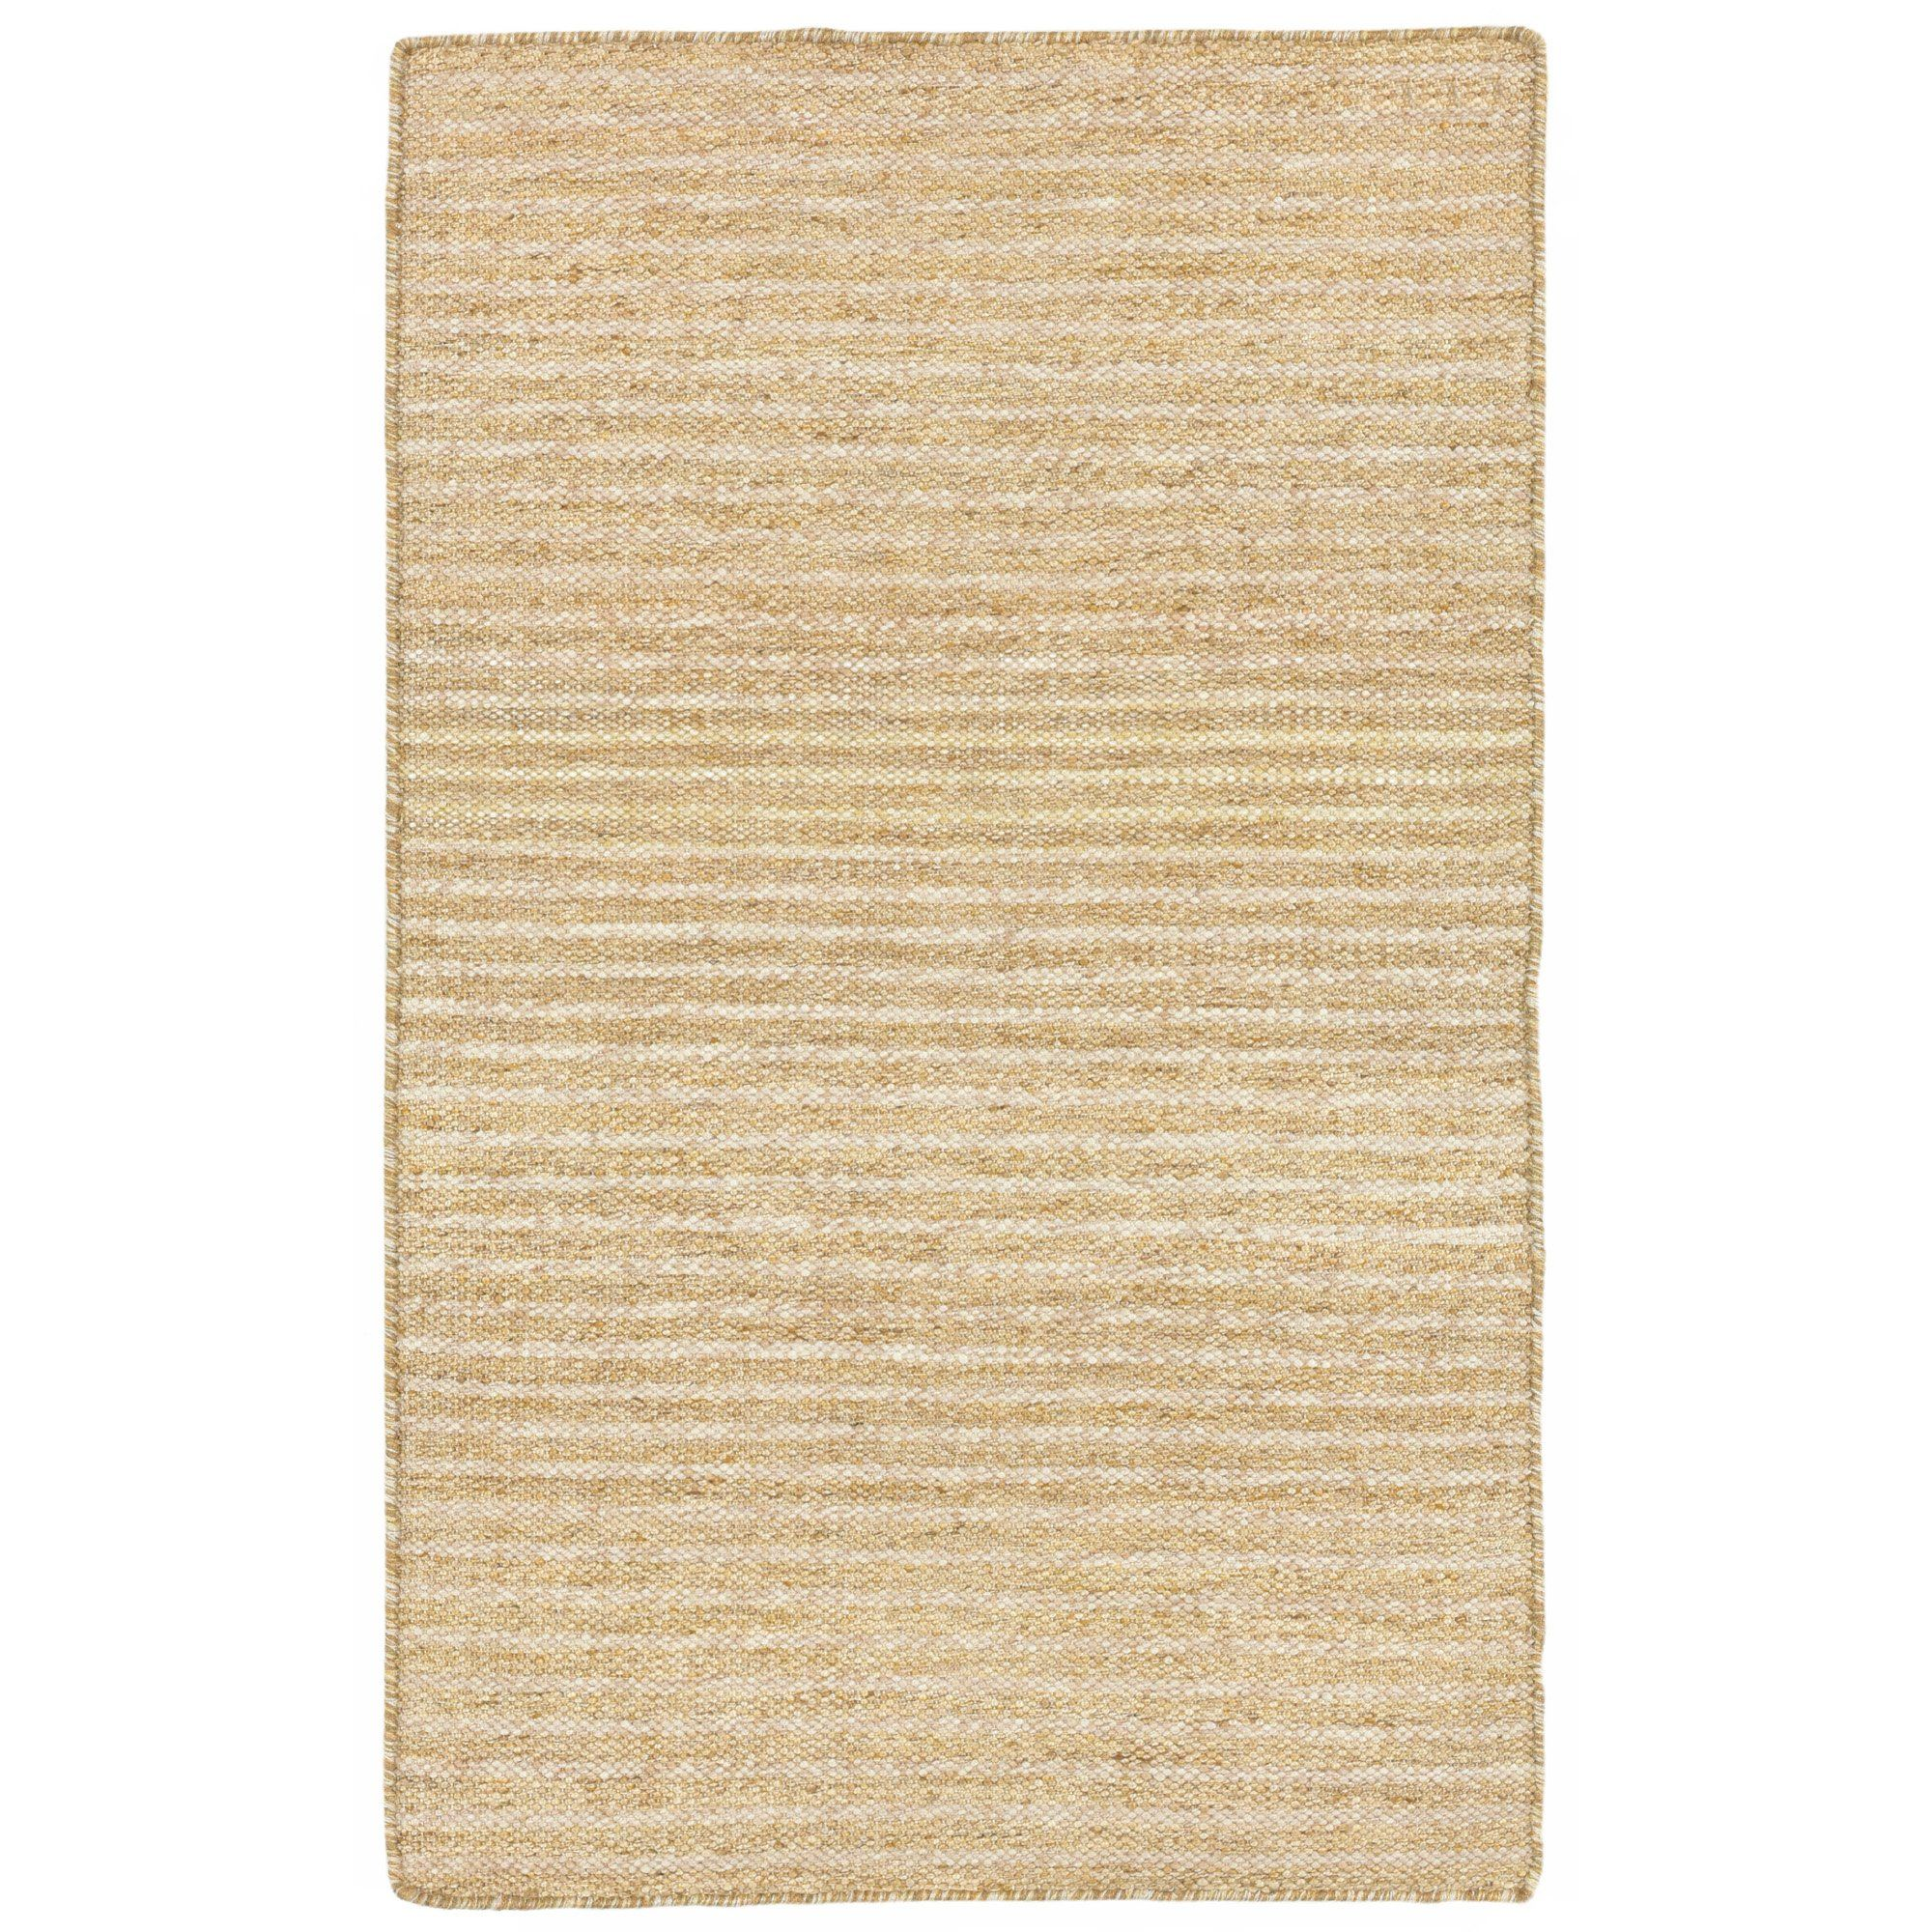 Trans-Ocean Imports MJE23620312 Liora Manne Mojave Pencil Stripe ...